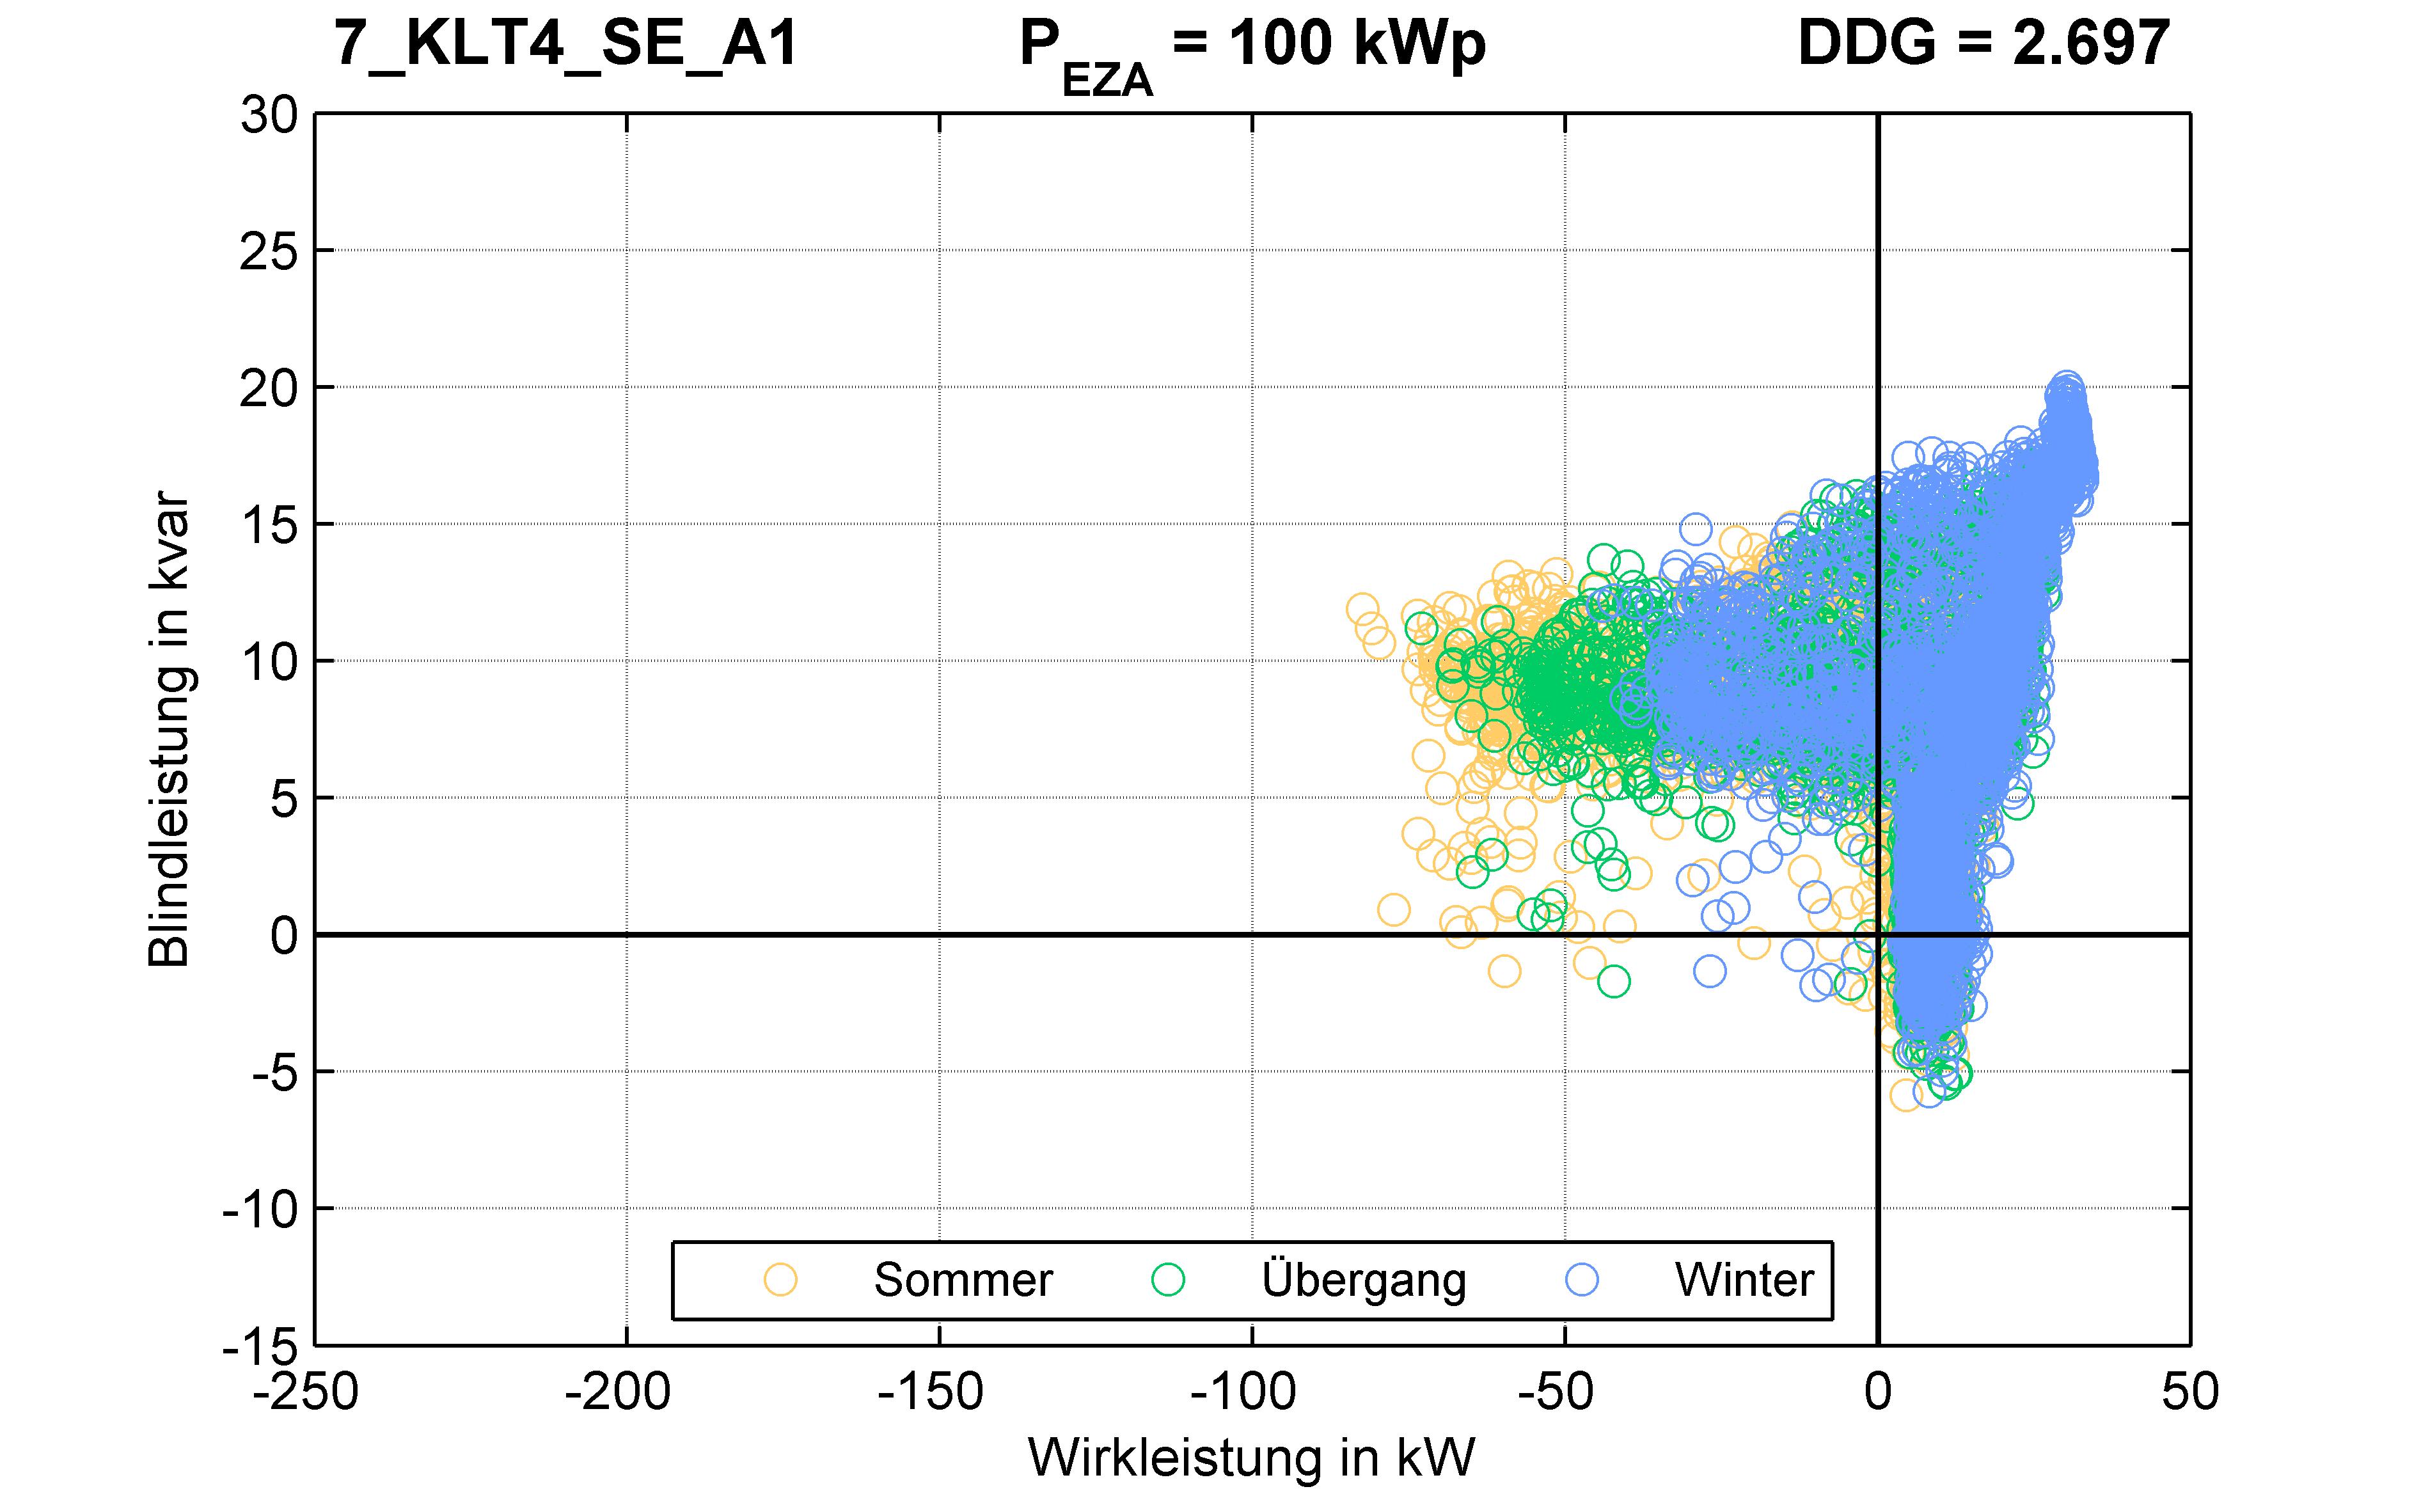 KLT4 | Längsregler (SE) A1 | PQ-Verhalten